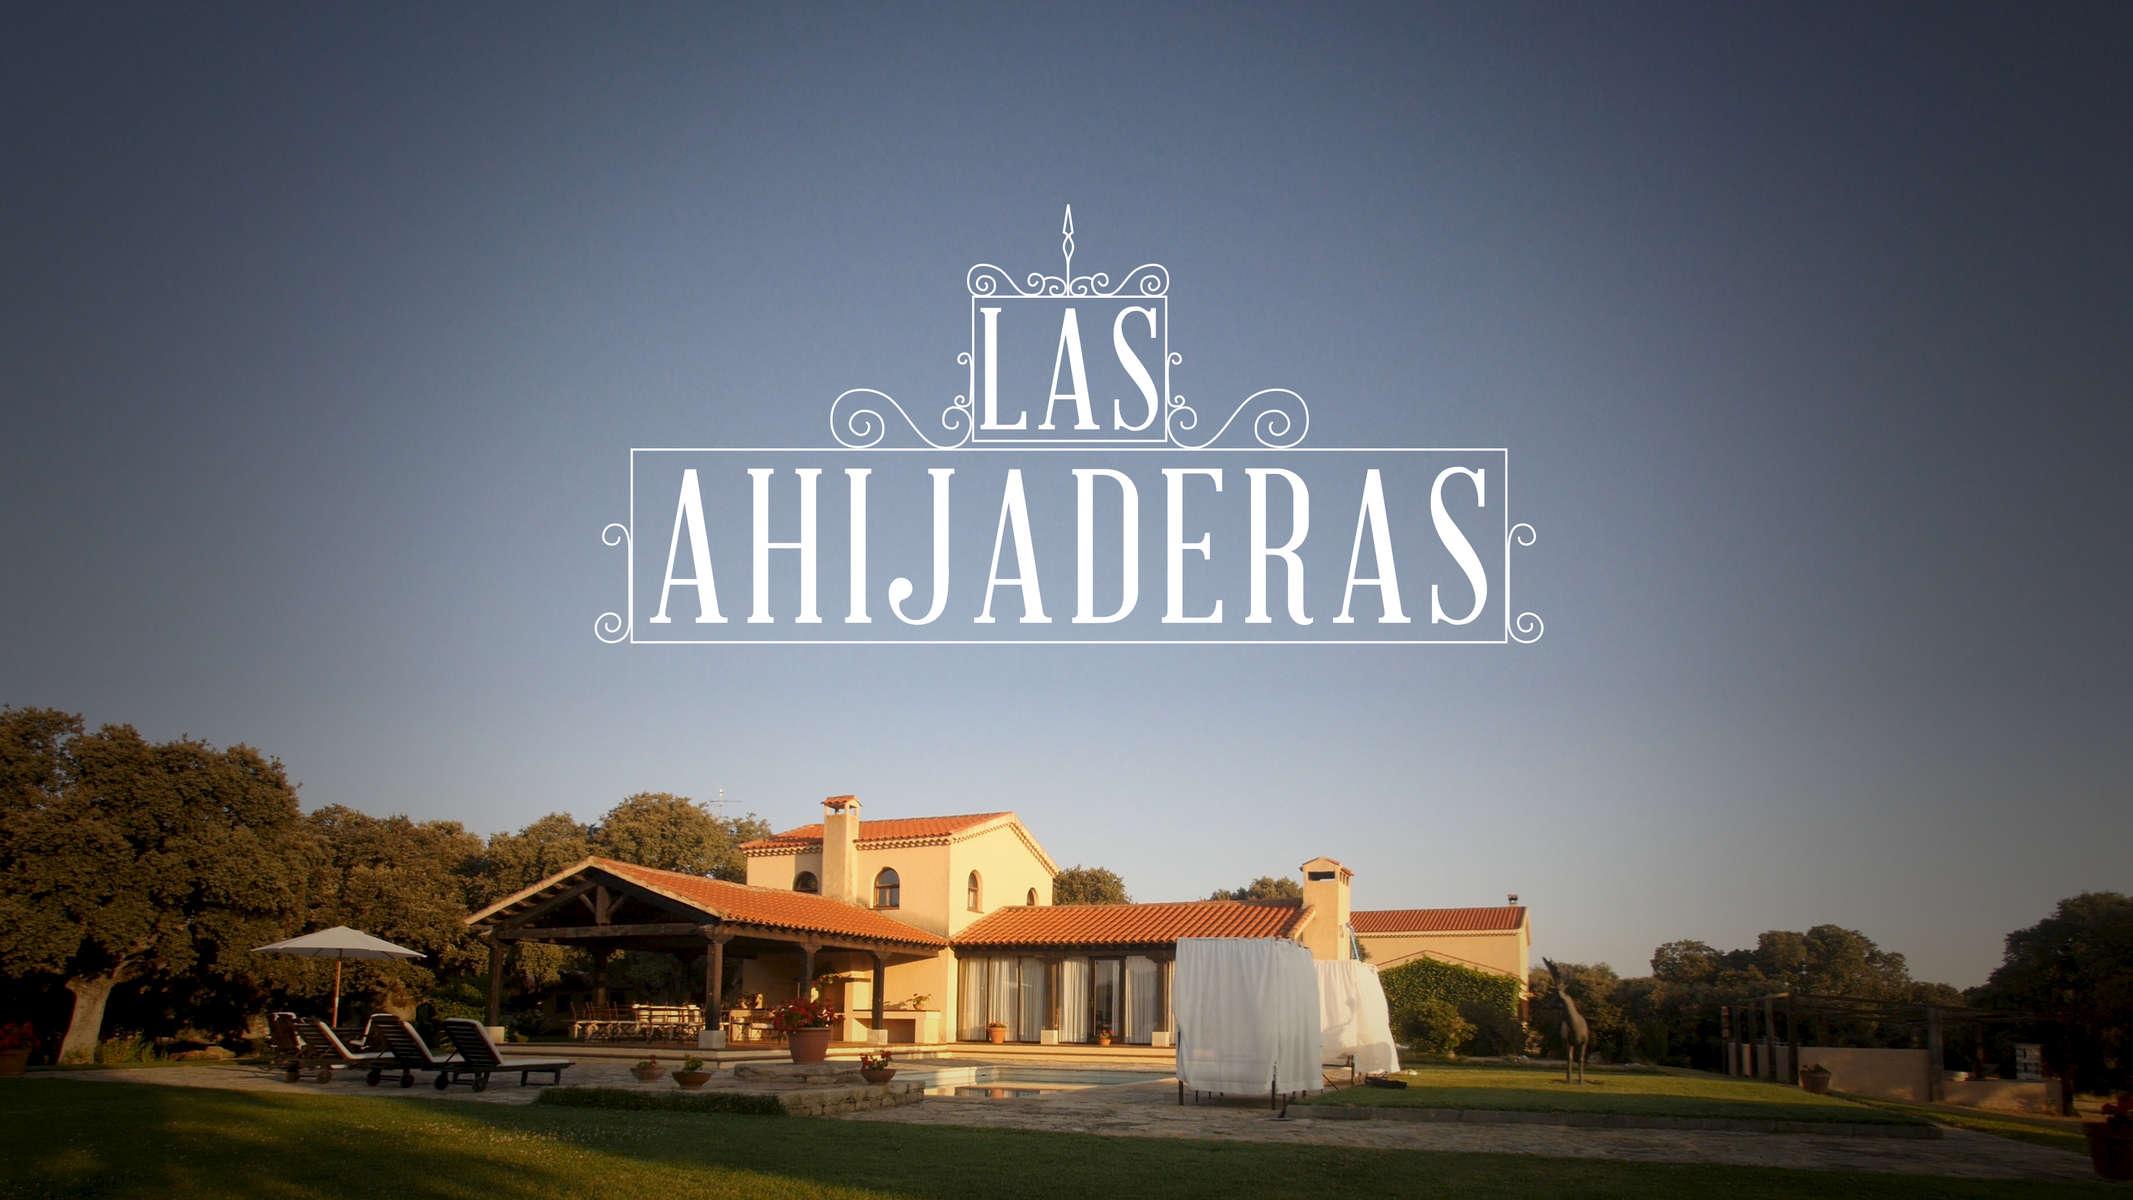 {quote}AHIJADERAS{quote} | CLIENT: LAS AHIJADERAS LODGE | CAMINITOFILMS: PRODUCTION, CINEMATOGRAPHY & EDIT